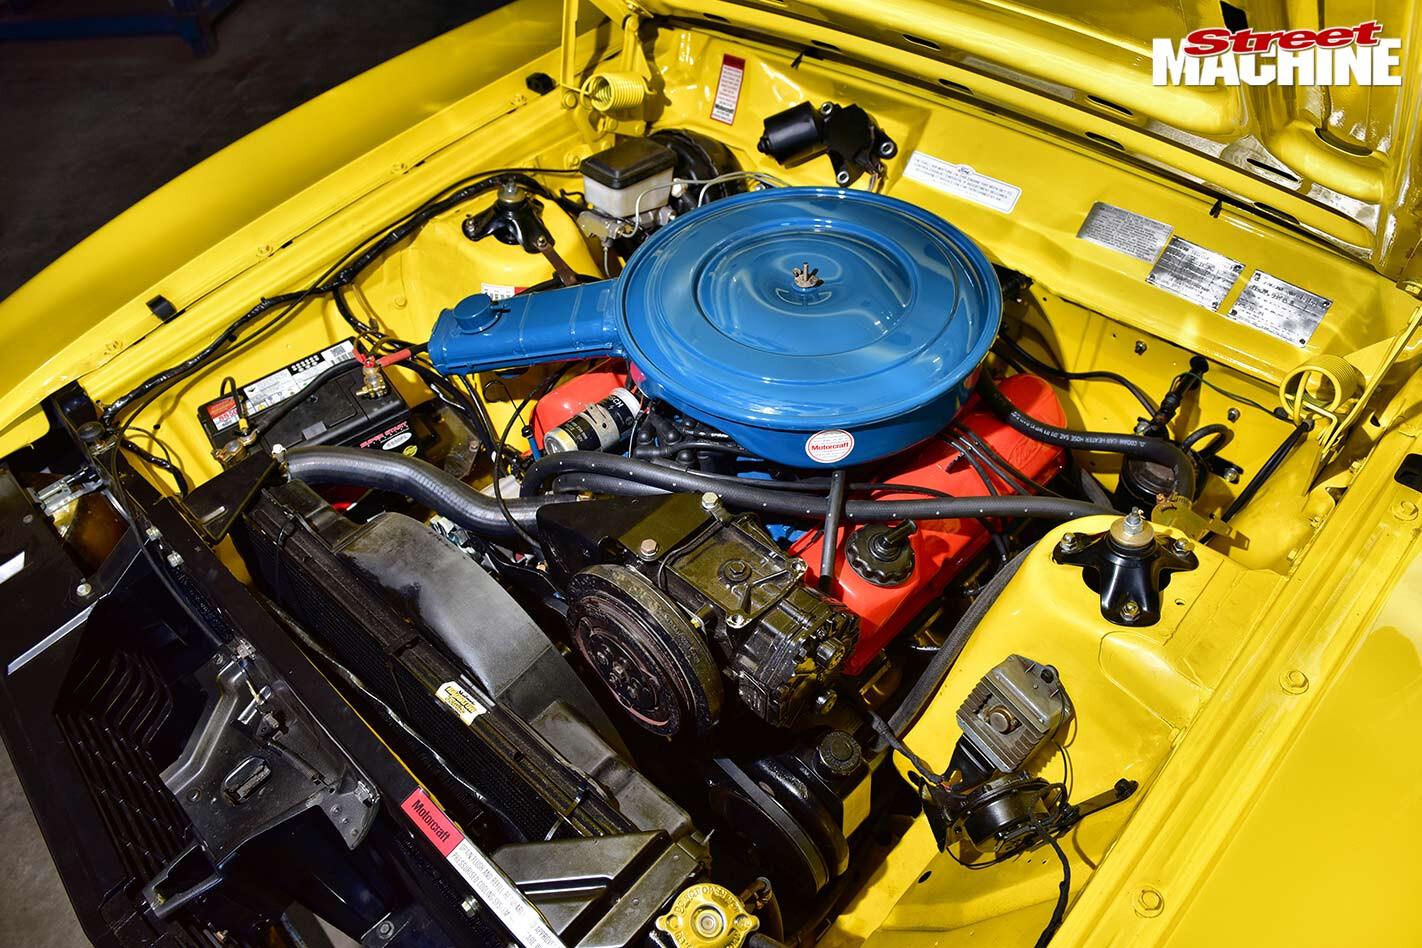 Ford XC Fairmont engine bay